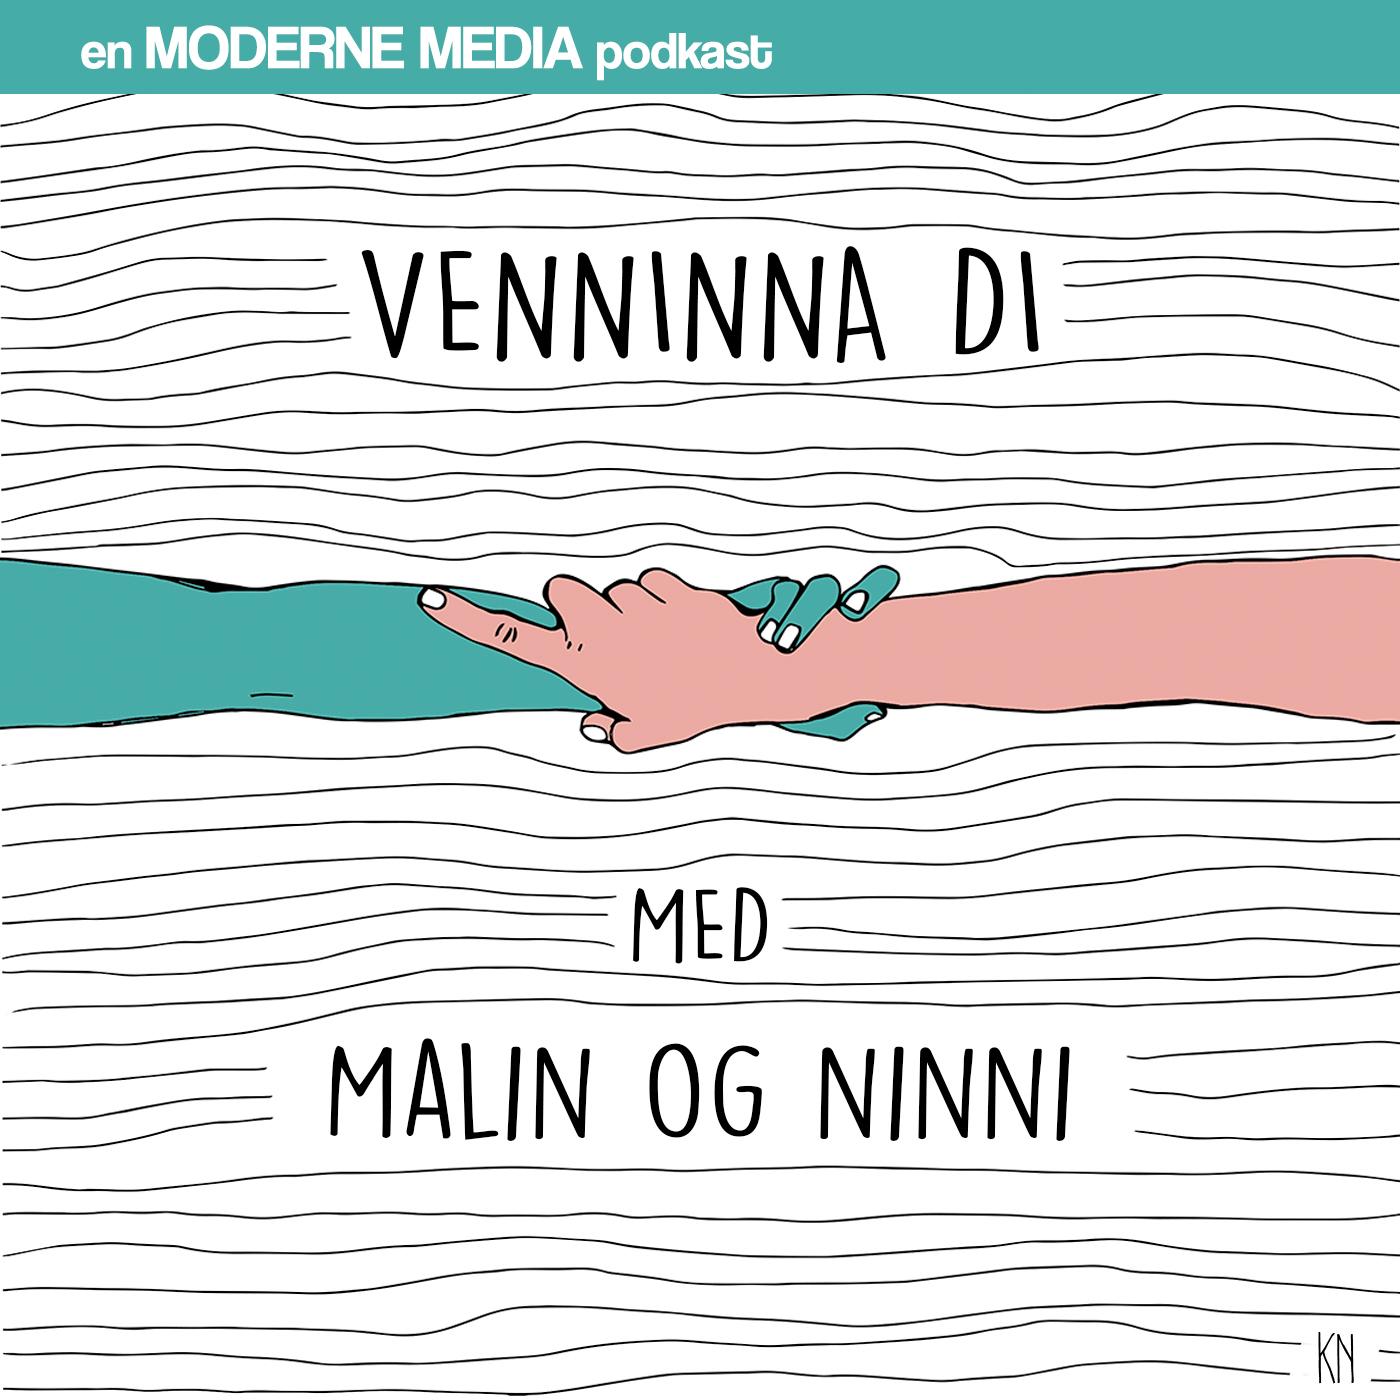 Podkast - Venninnadi - Moderne Media - info@modernemedia.no